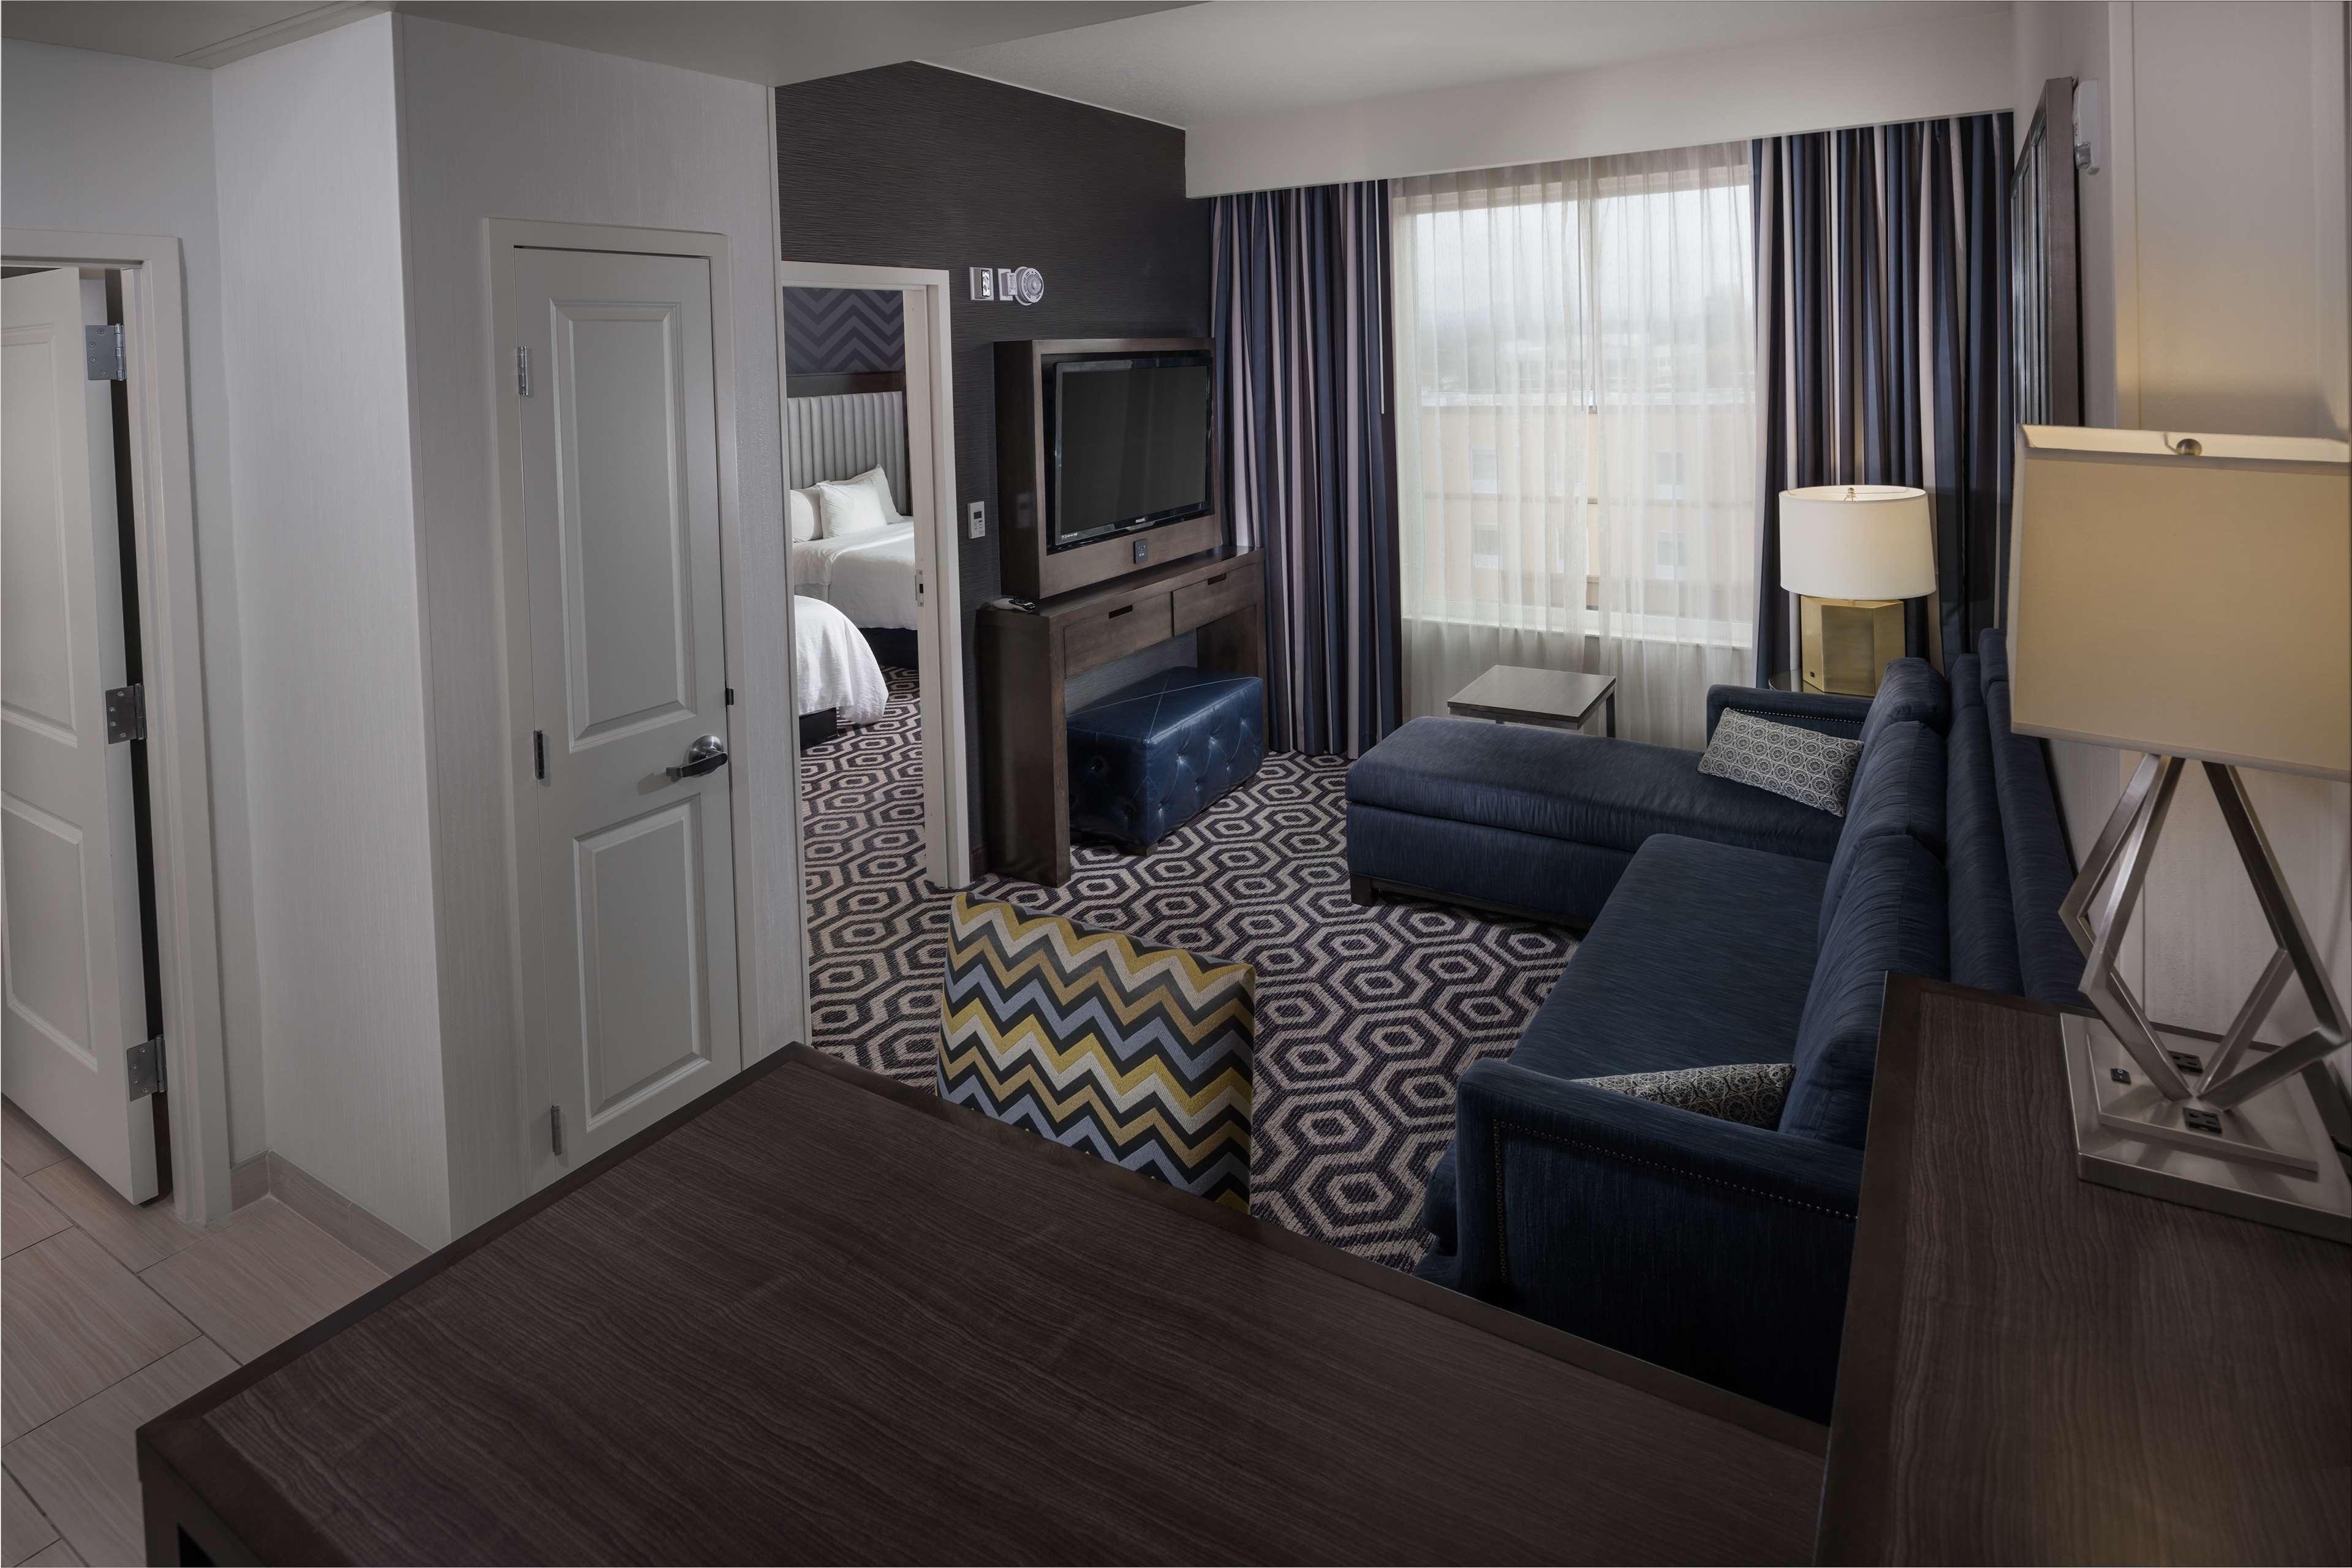 Embassy Suites by Hilton Portland Hillsboro, Oregon image 14